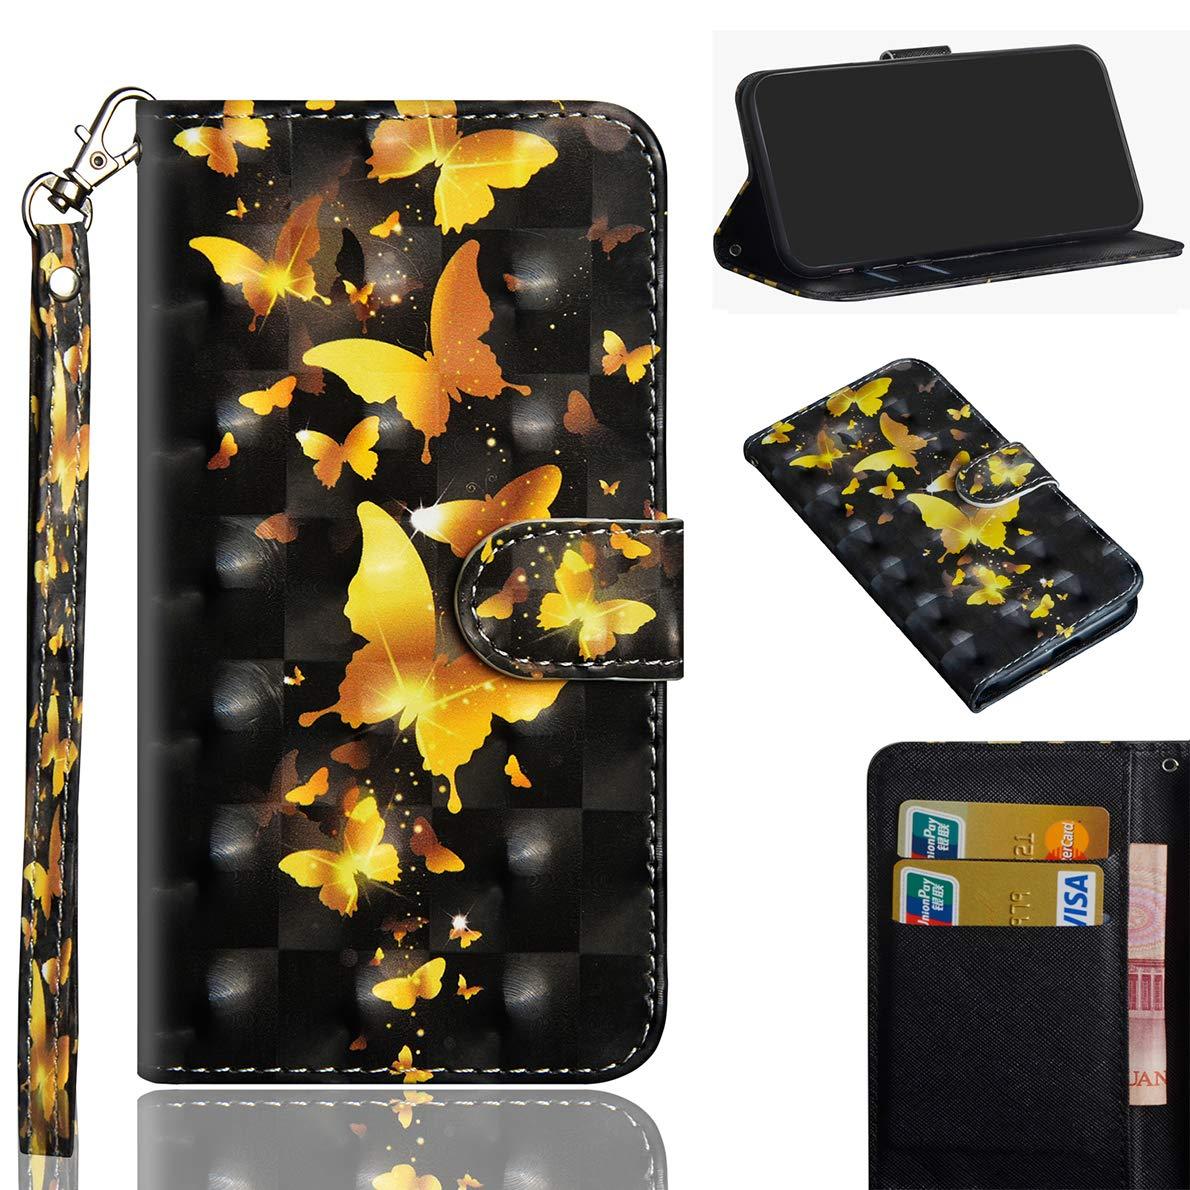 Sony Xperia XZ3 Hülle, SHUYIT Farbe Muster 3D PU Leder Tasche Cover Flip Wallet Case Bookcase Handyhülle Lederhülle Ständer Klapphülle Schutzhülle für Sony Xperia XZ3 Schale Etui Sony Xperia XZ3 Hülle